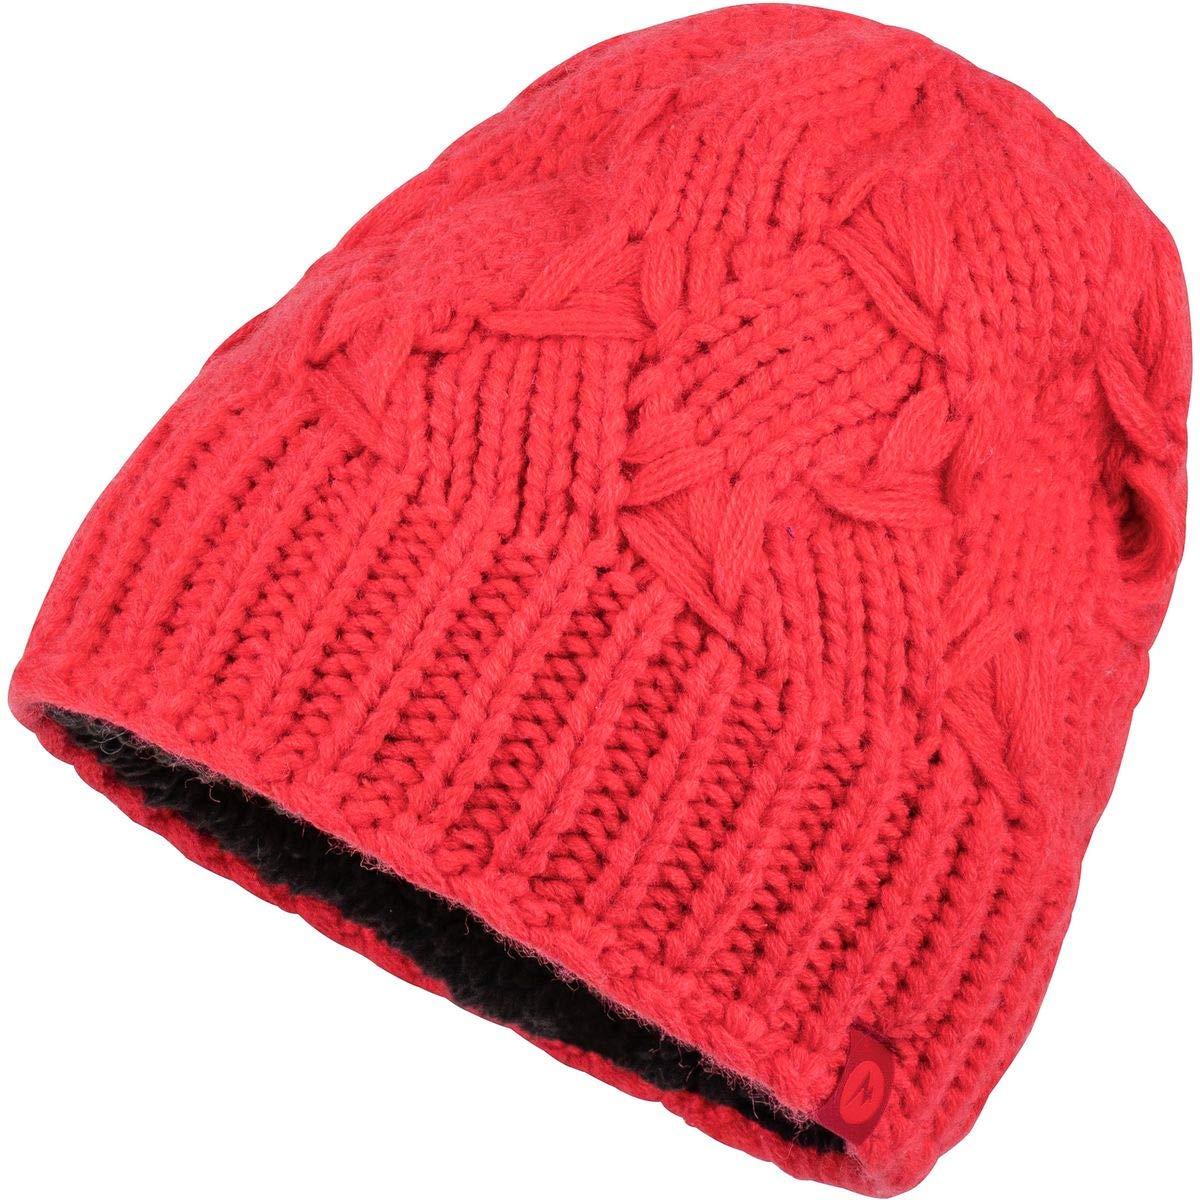 9f3824ac7 Marmot Kelly Hat - Women's Scarlet Red, One Size at Amazon Women's ...